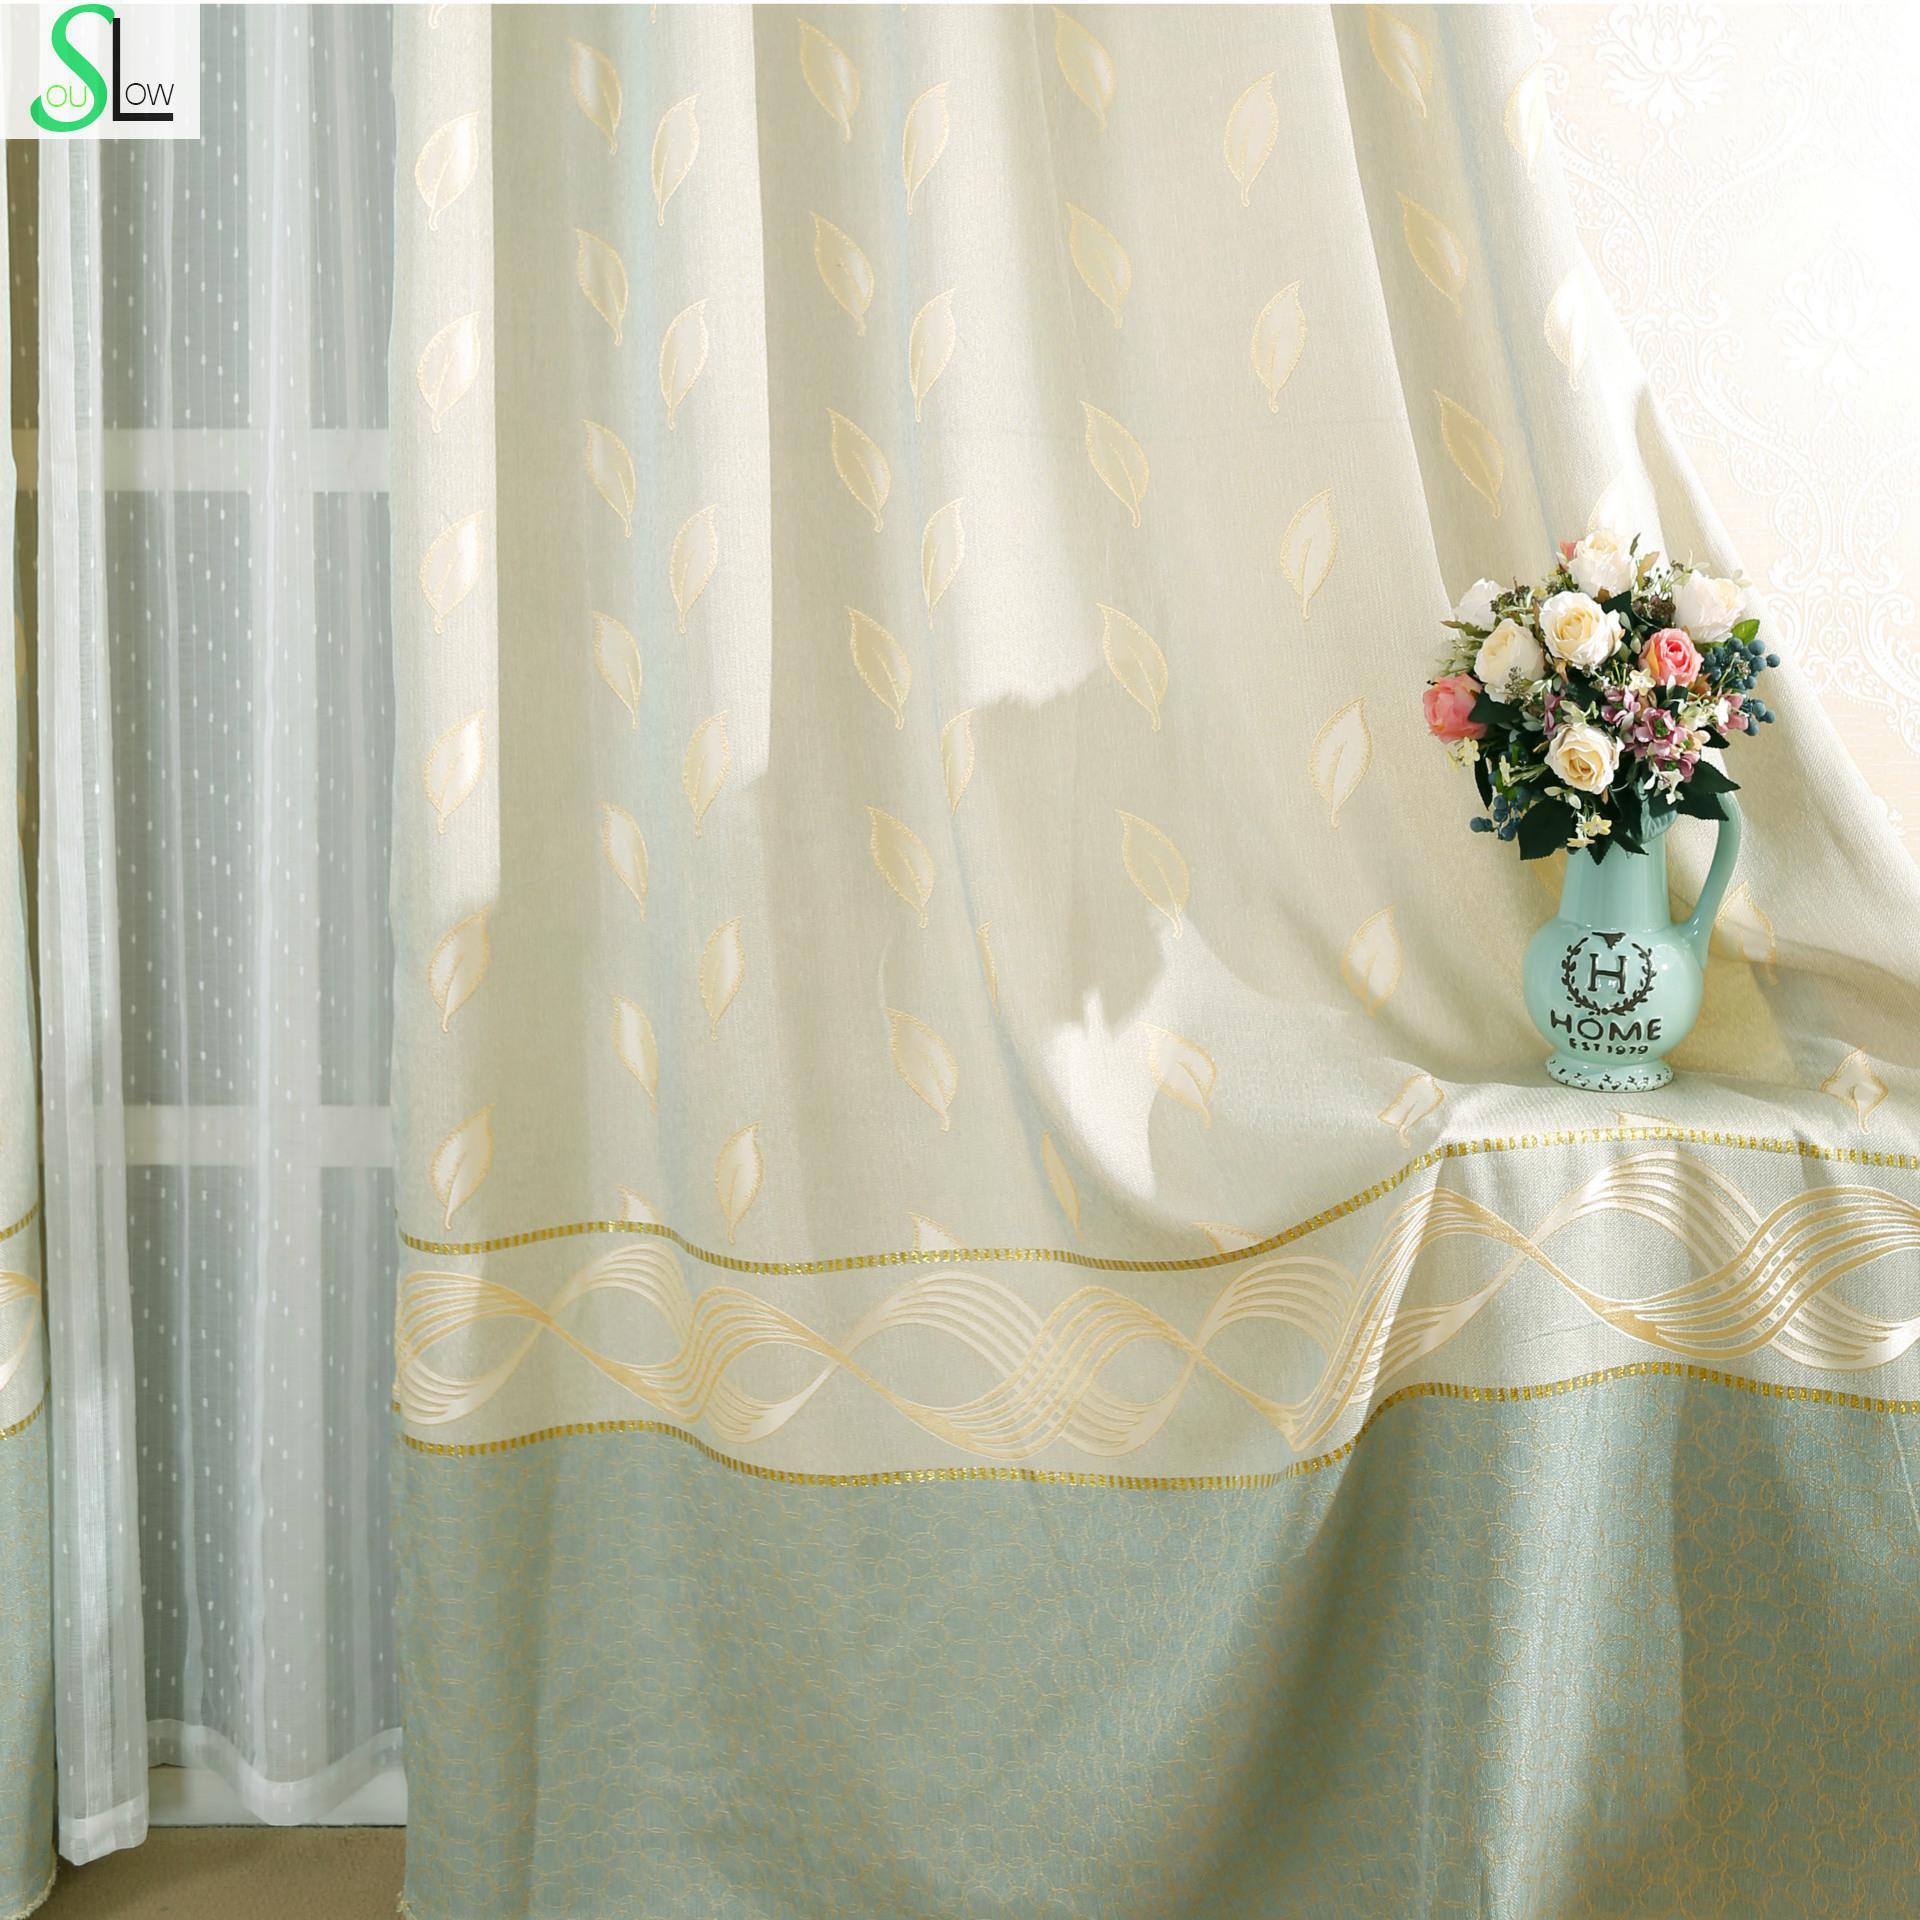 Cafe curtains for bedroom - Slow Soul Light Blue Fresh Jacquard Curtains Linen Curtain Pastoral Leaves Tulle For Living Room Kitchen Cafe Bedroom Custom